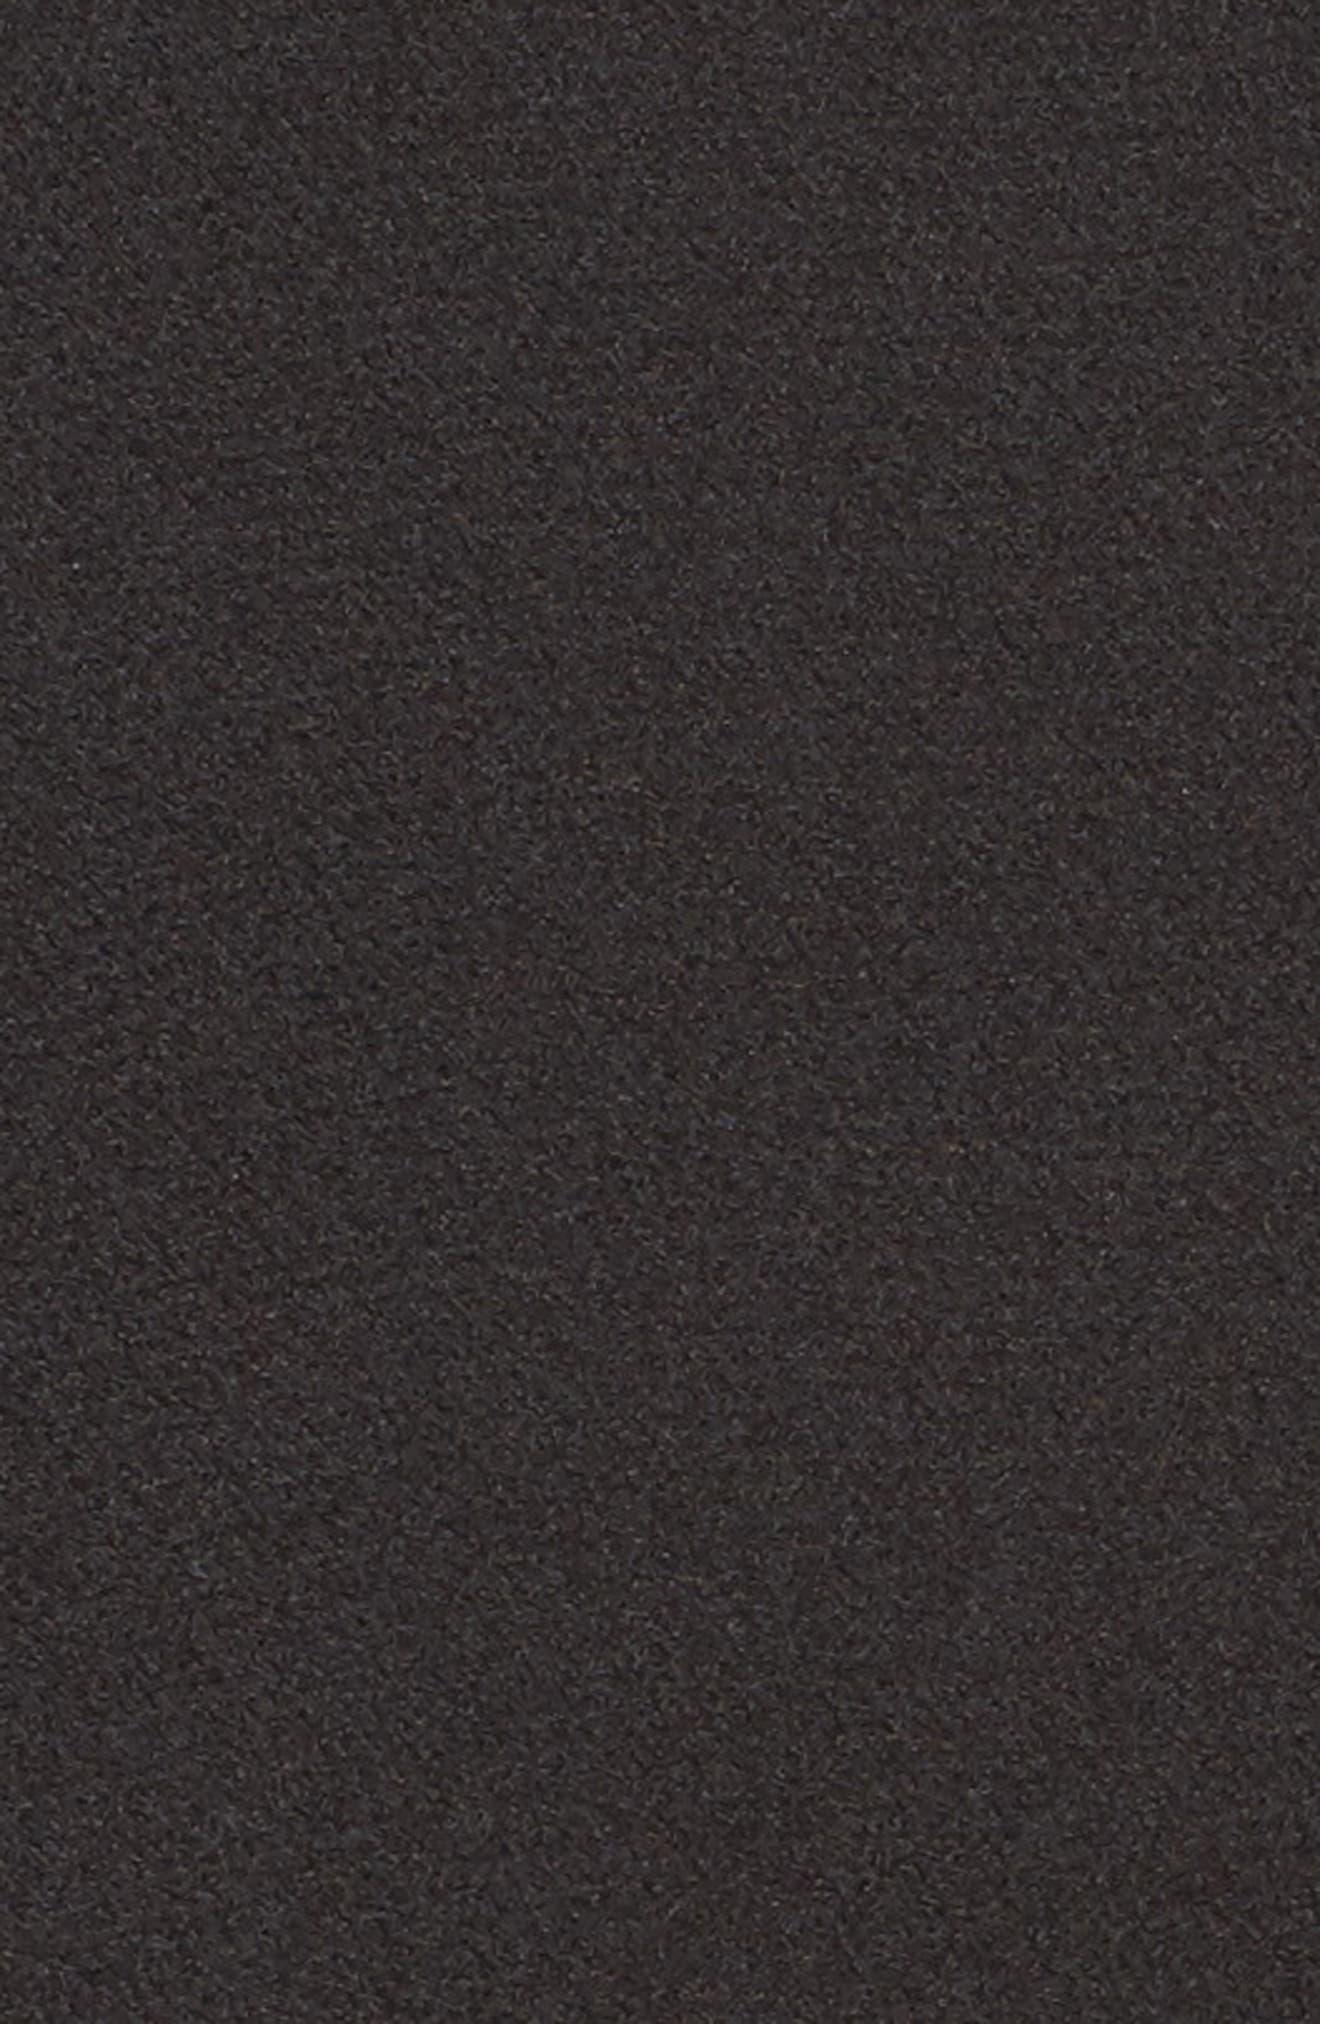 Ruffle Sleeve Satin Top,                             Alternate thumbnail 5, color,                             001